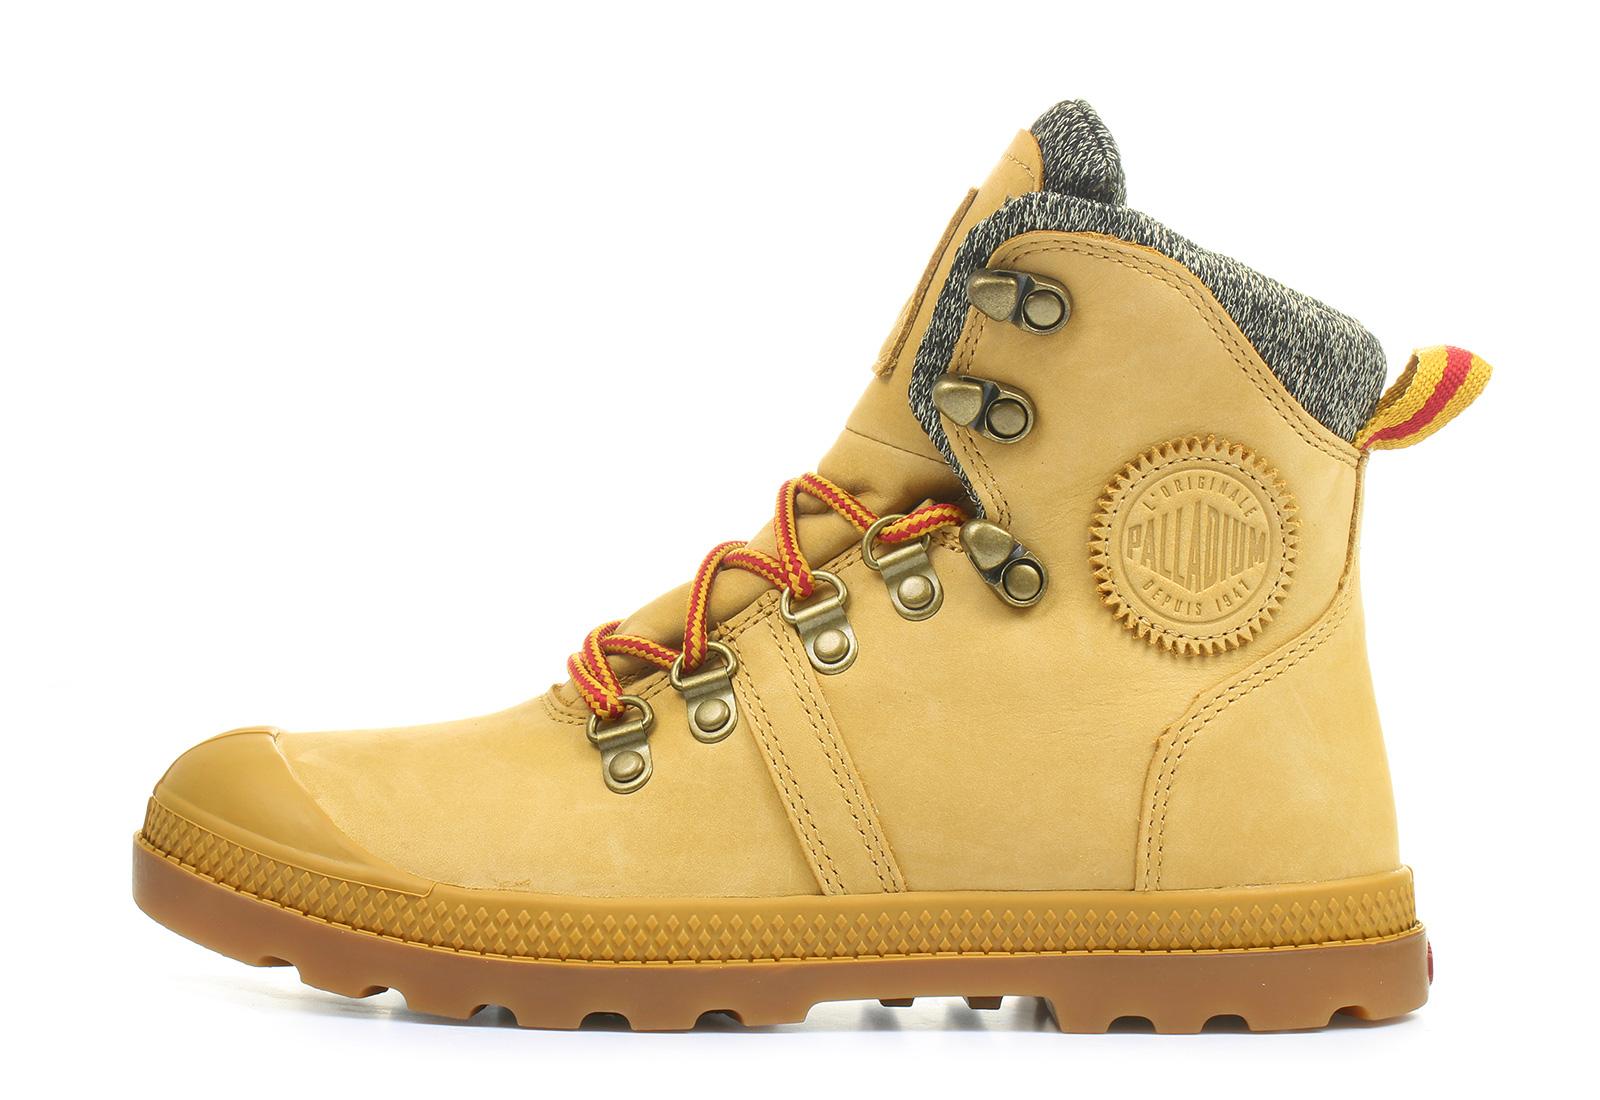 e77b3eabb7fb Palladium Bakancs - Pallabrouse Hikr Lp - 95140-278-M - Office Shoes ...